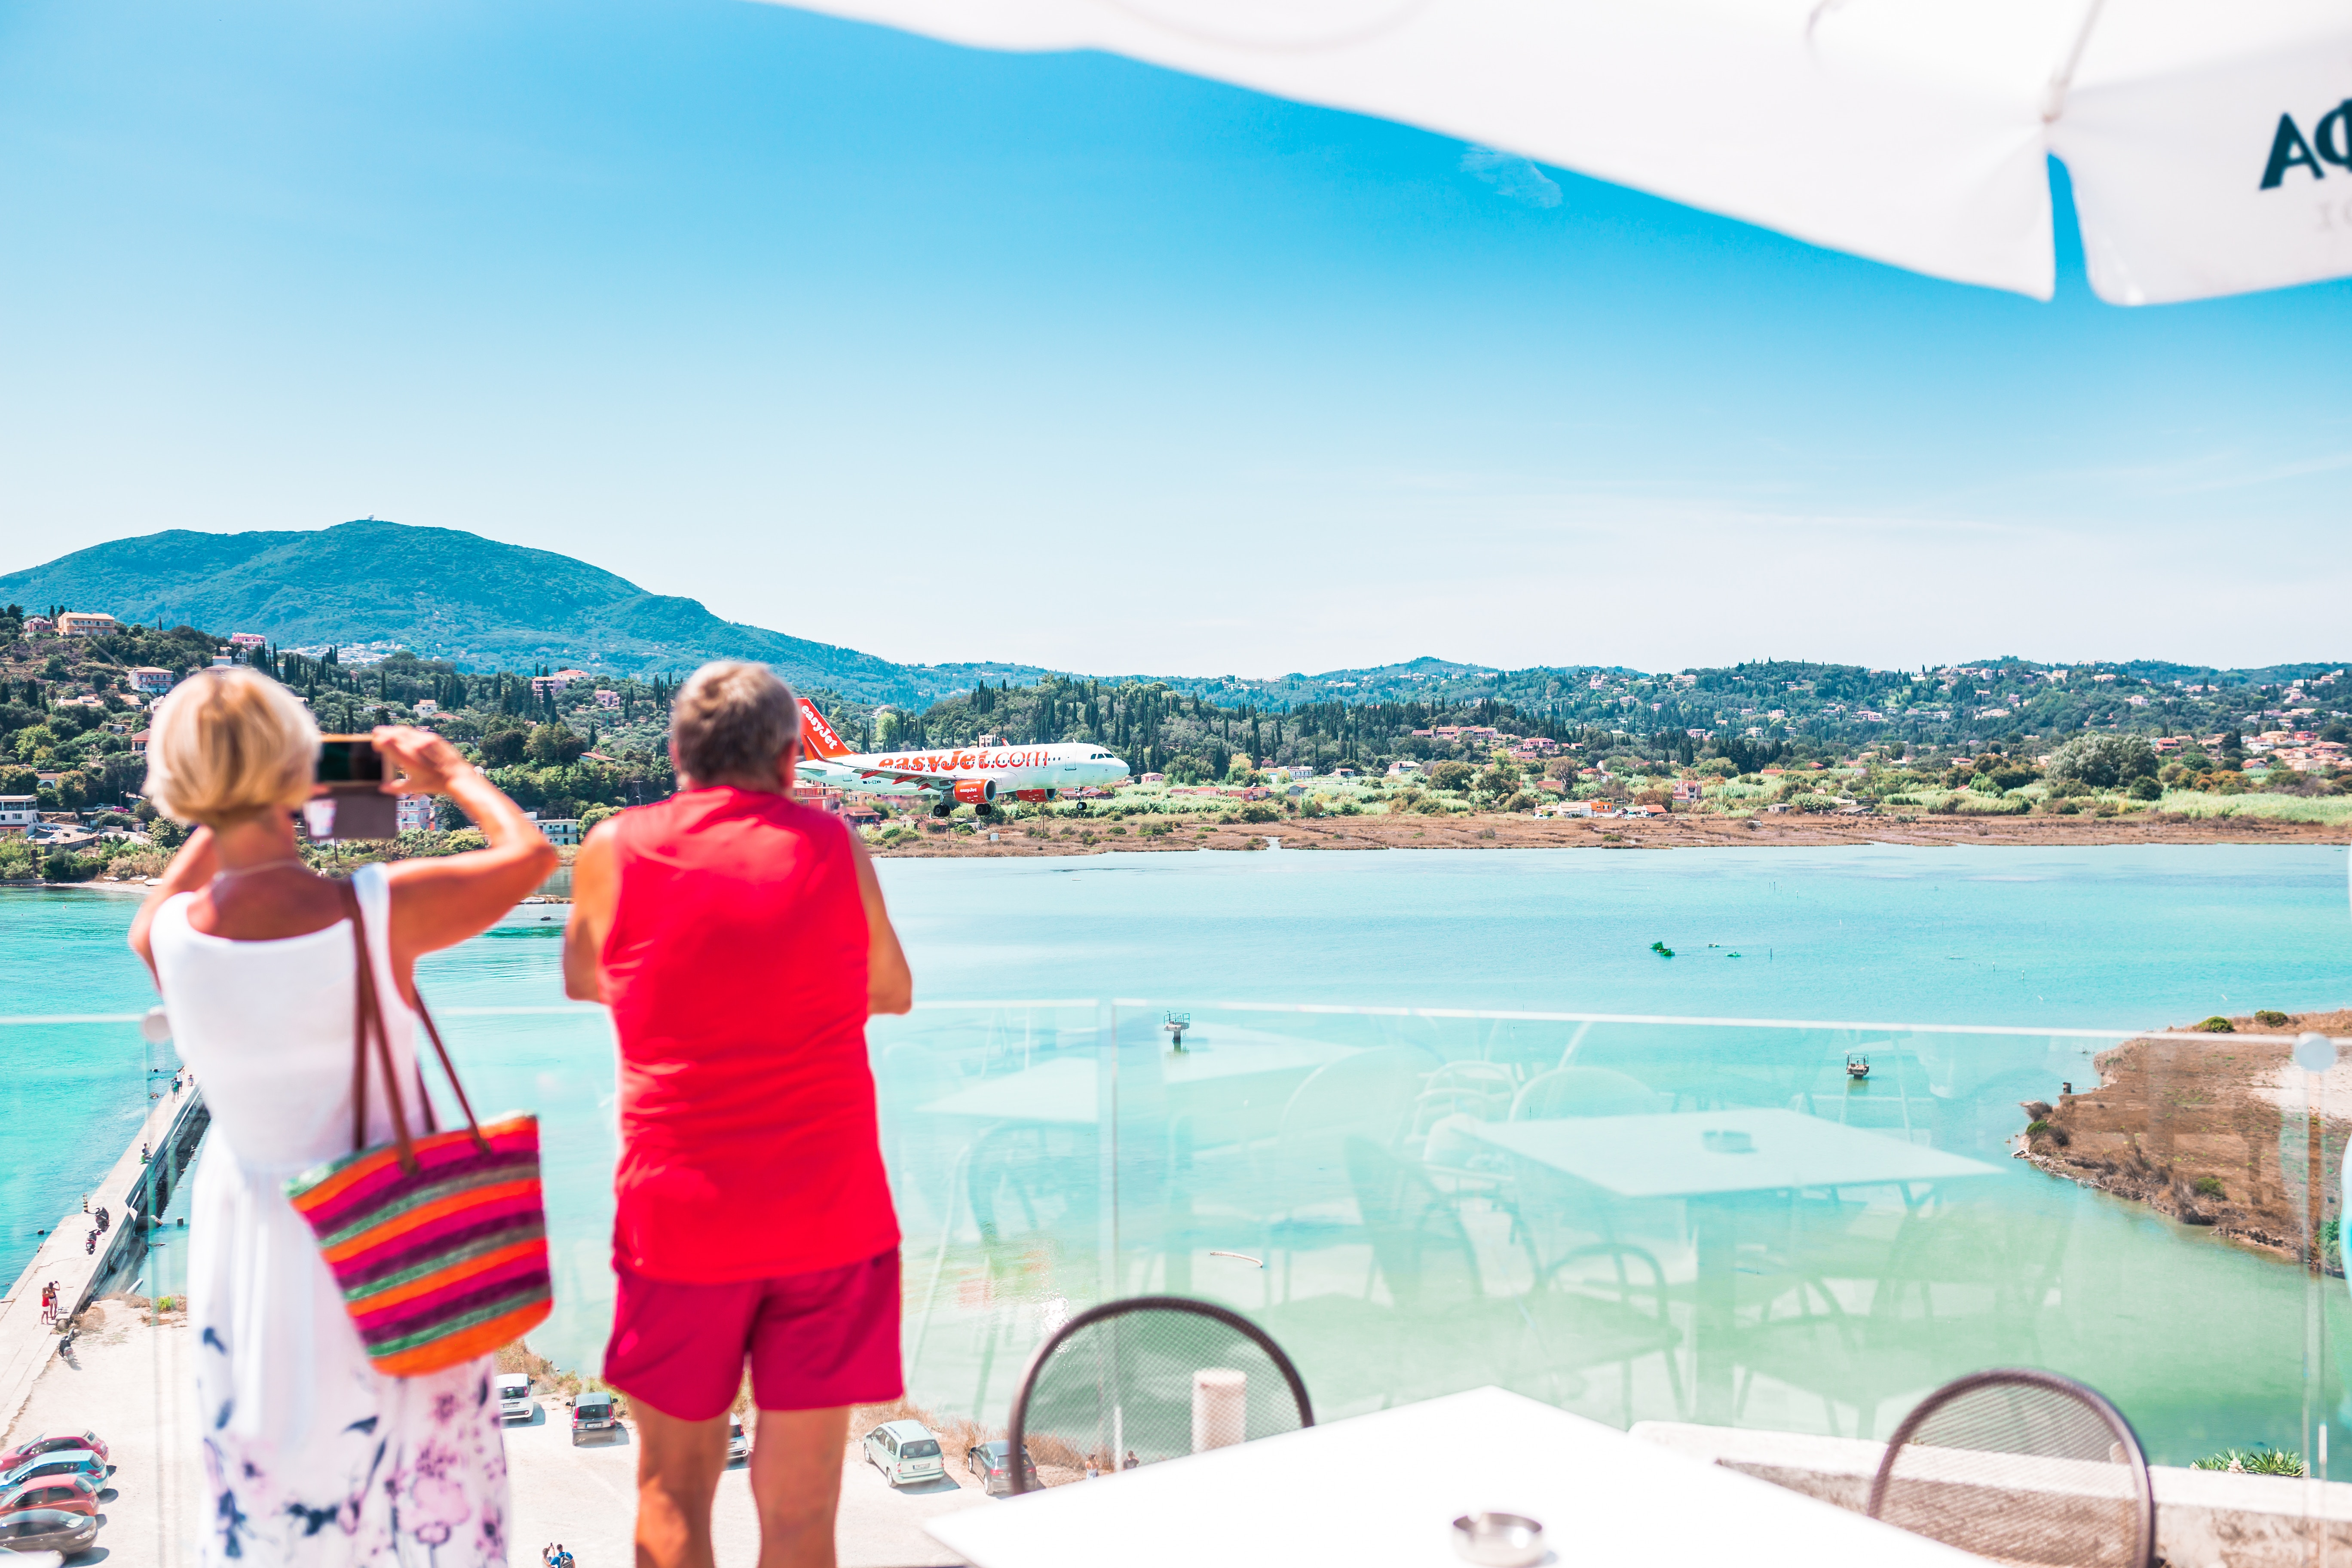 Image of business travelers enjoying a leisurely vacation